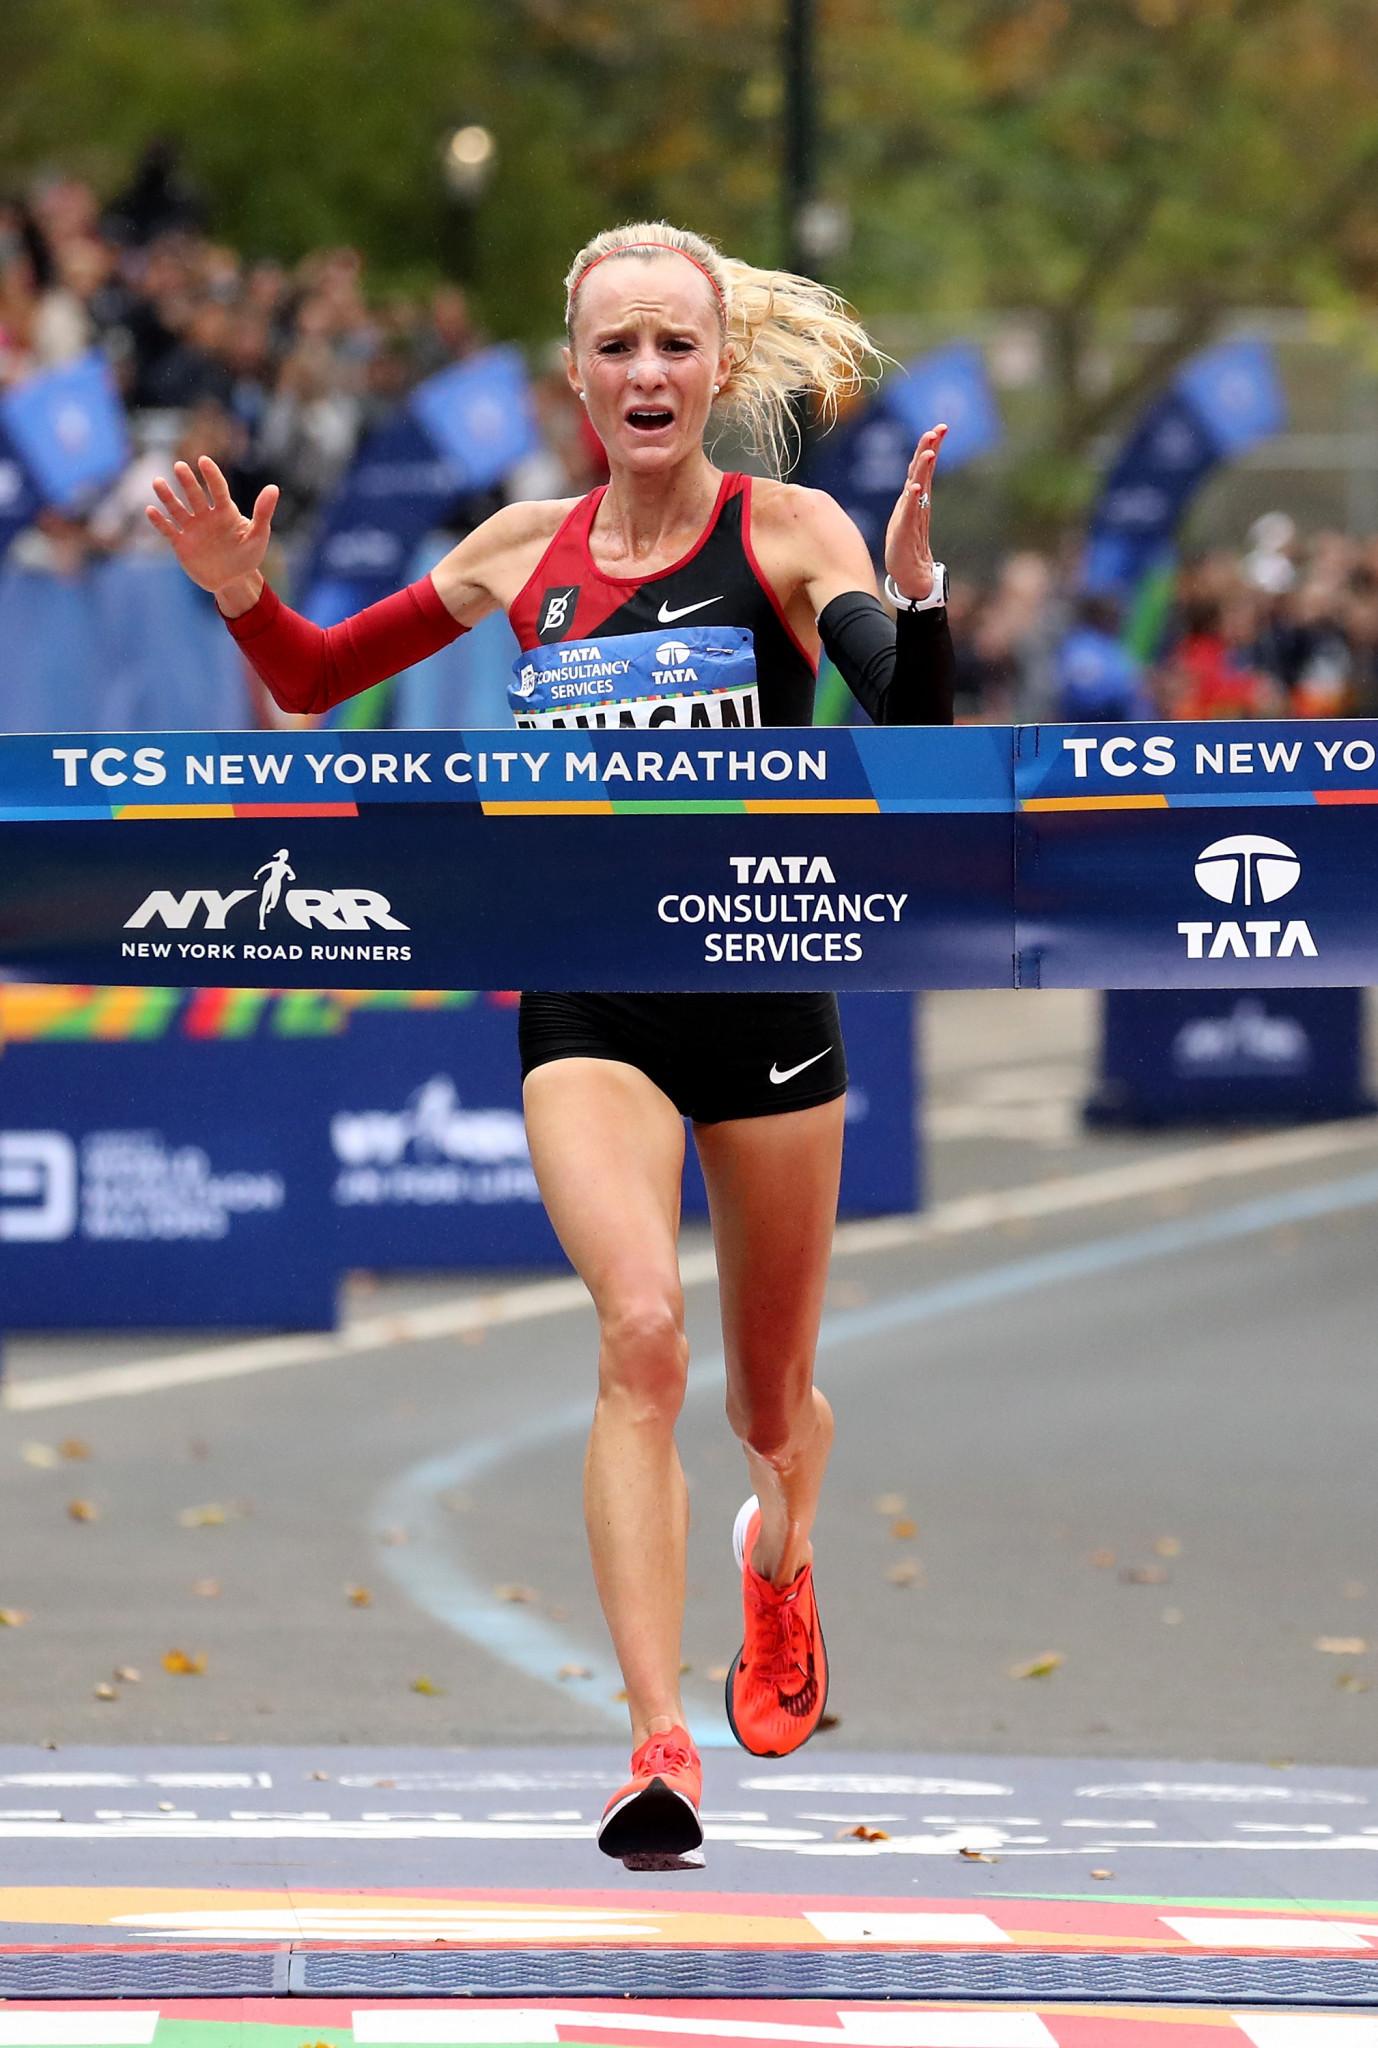 Shalane Flanagan, of the United States, celebrates winning the 2017 New York City Marathon ©Getty Images